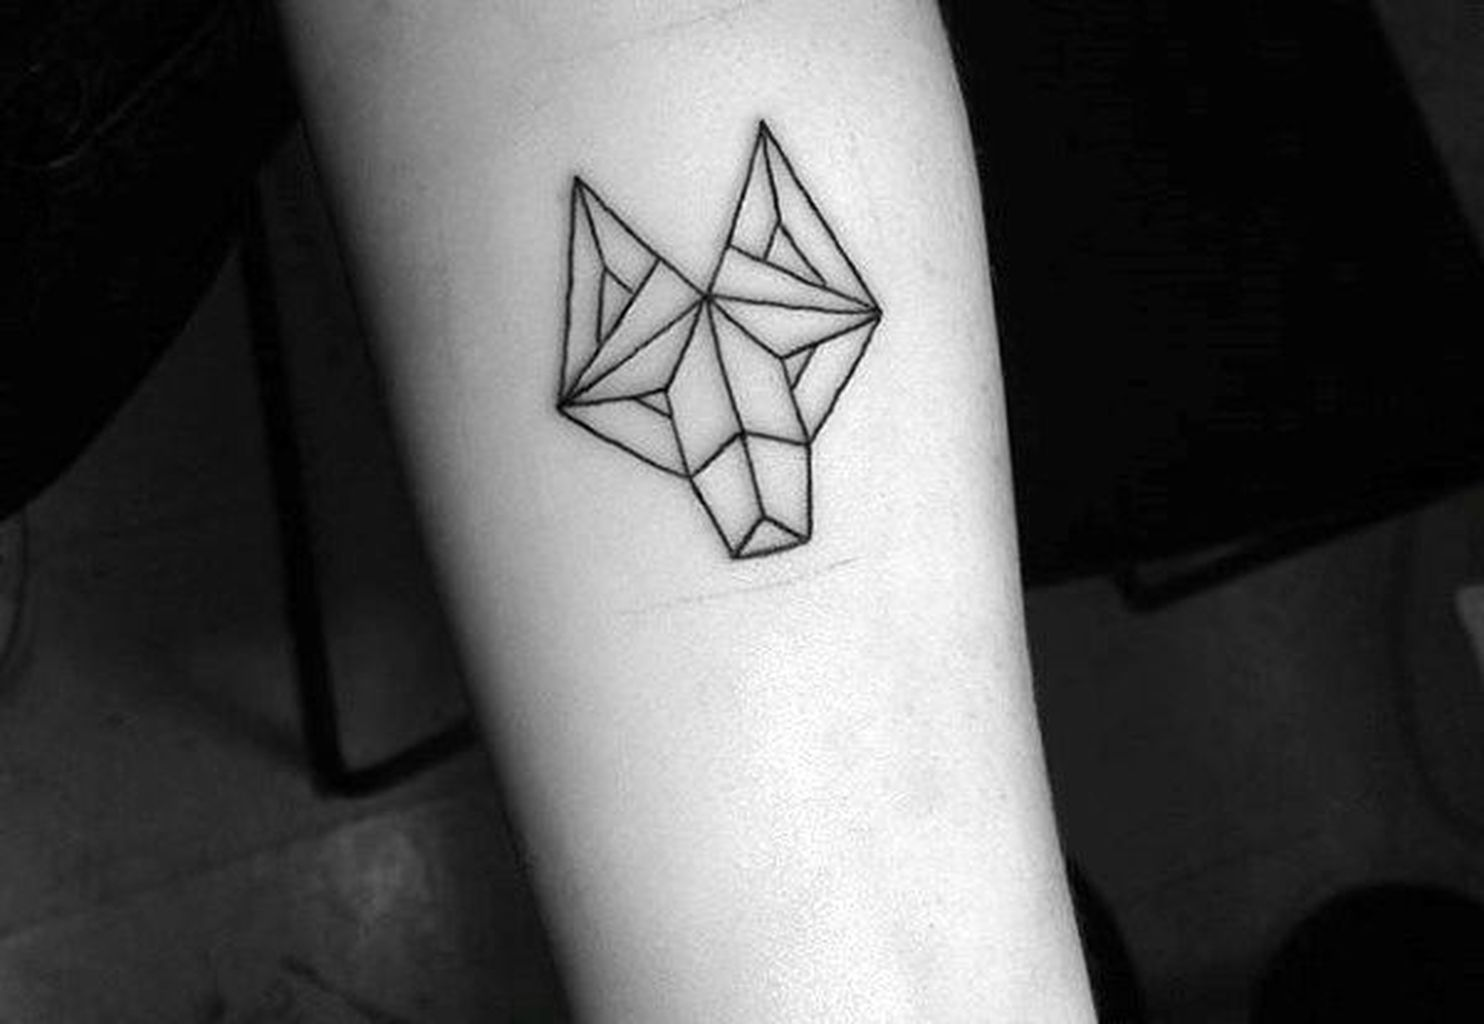 Cute and Sweet Small Tattoo Ideas Trends Tattoos Ideas